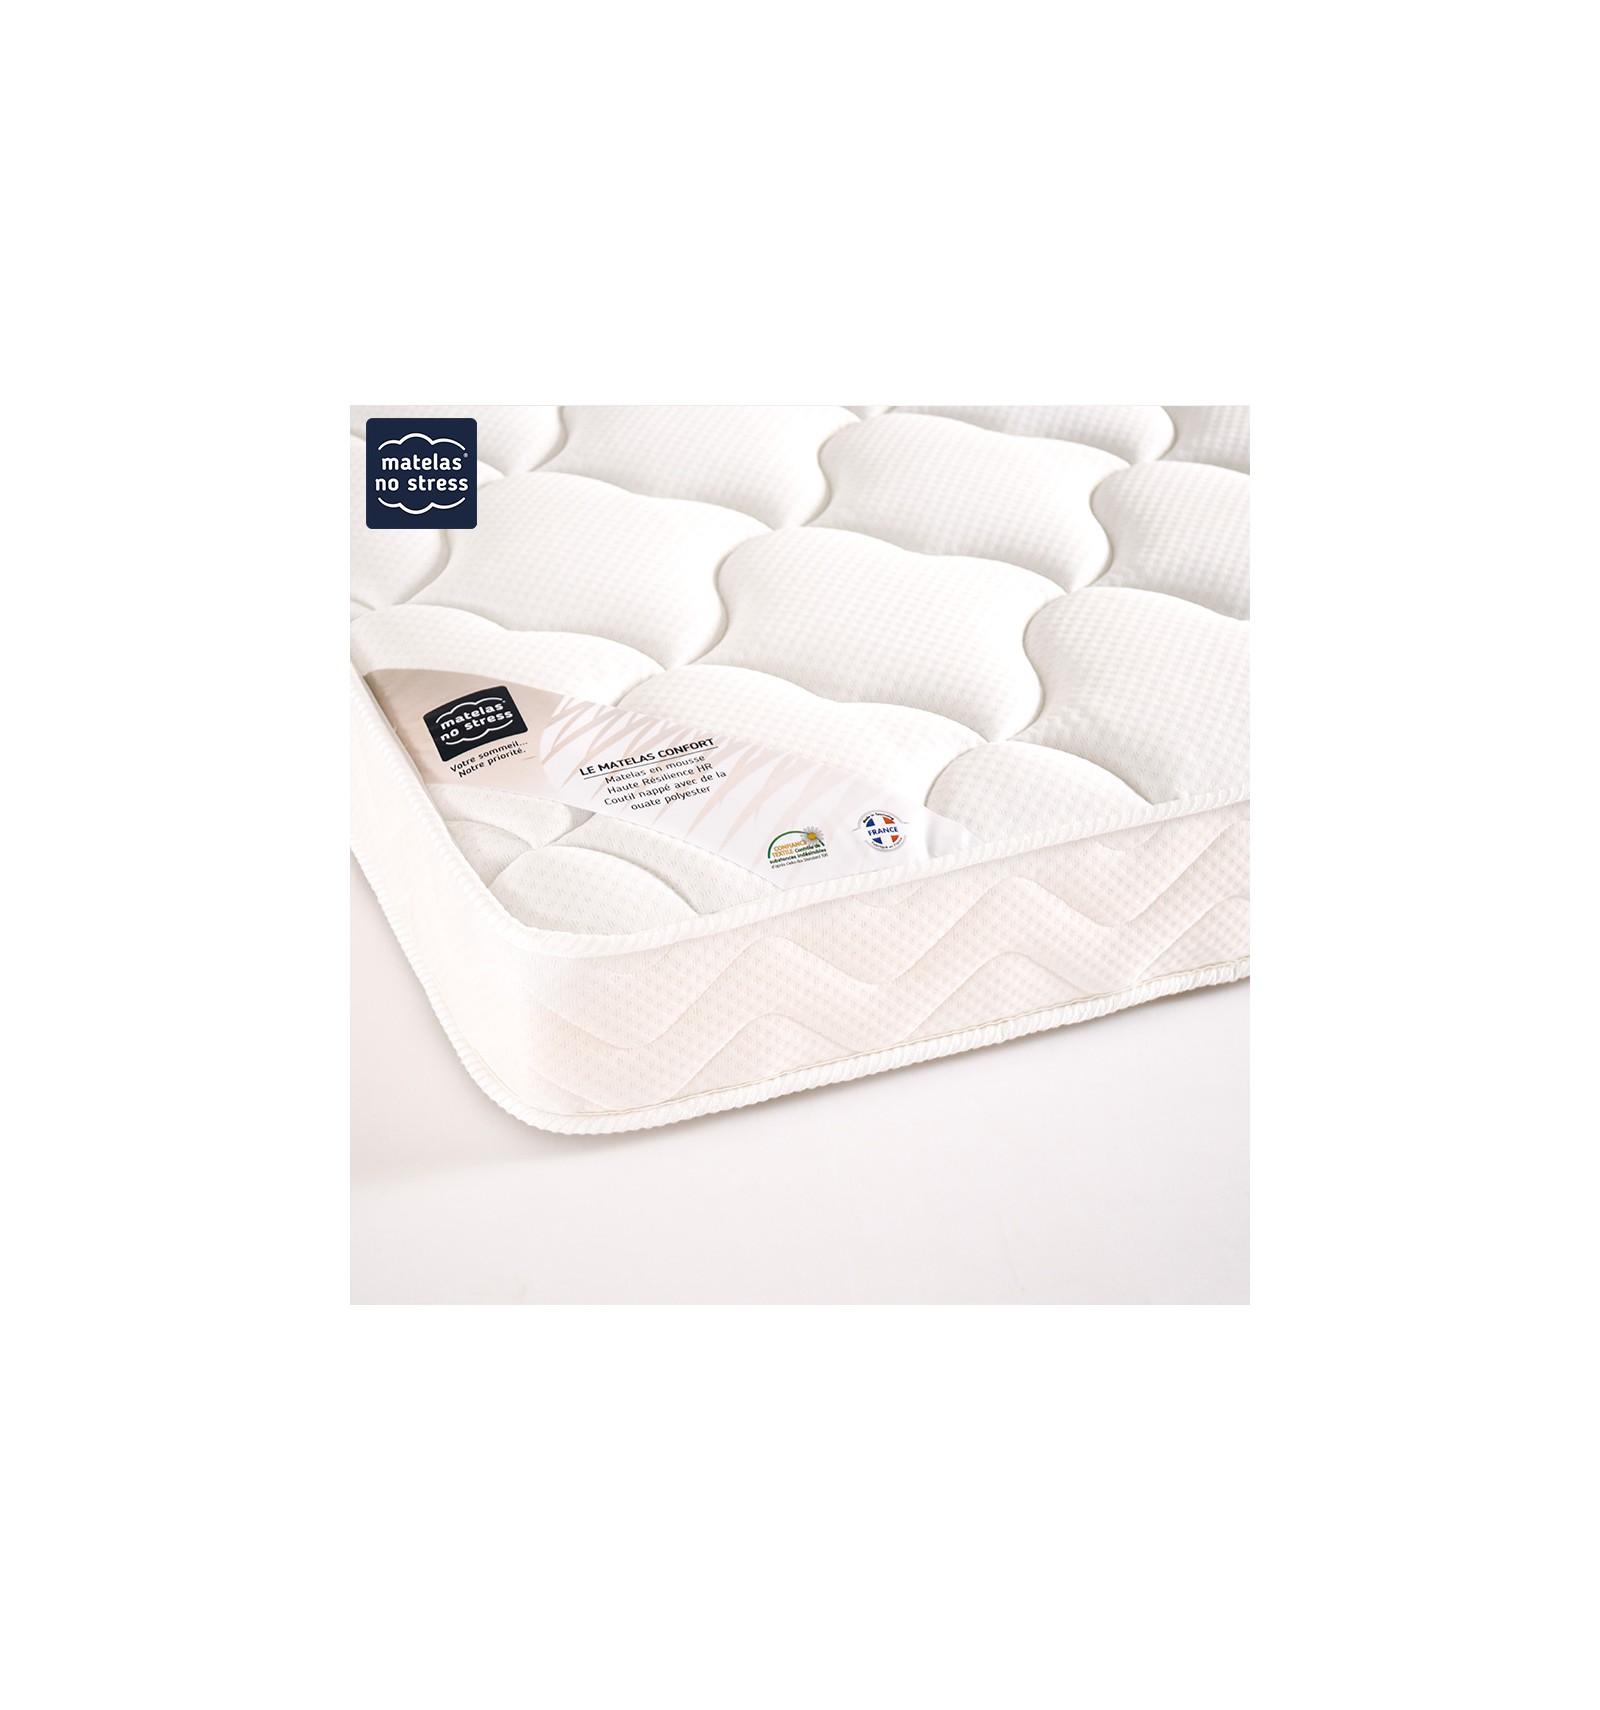 matelas enfant sur mesure 14 cm. Black Bedroom Furniture Sets. Home Design Ideas